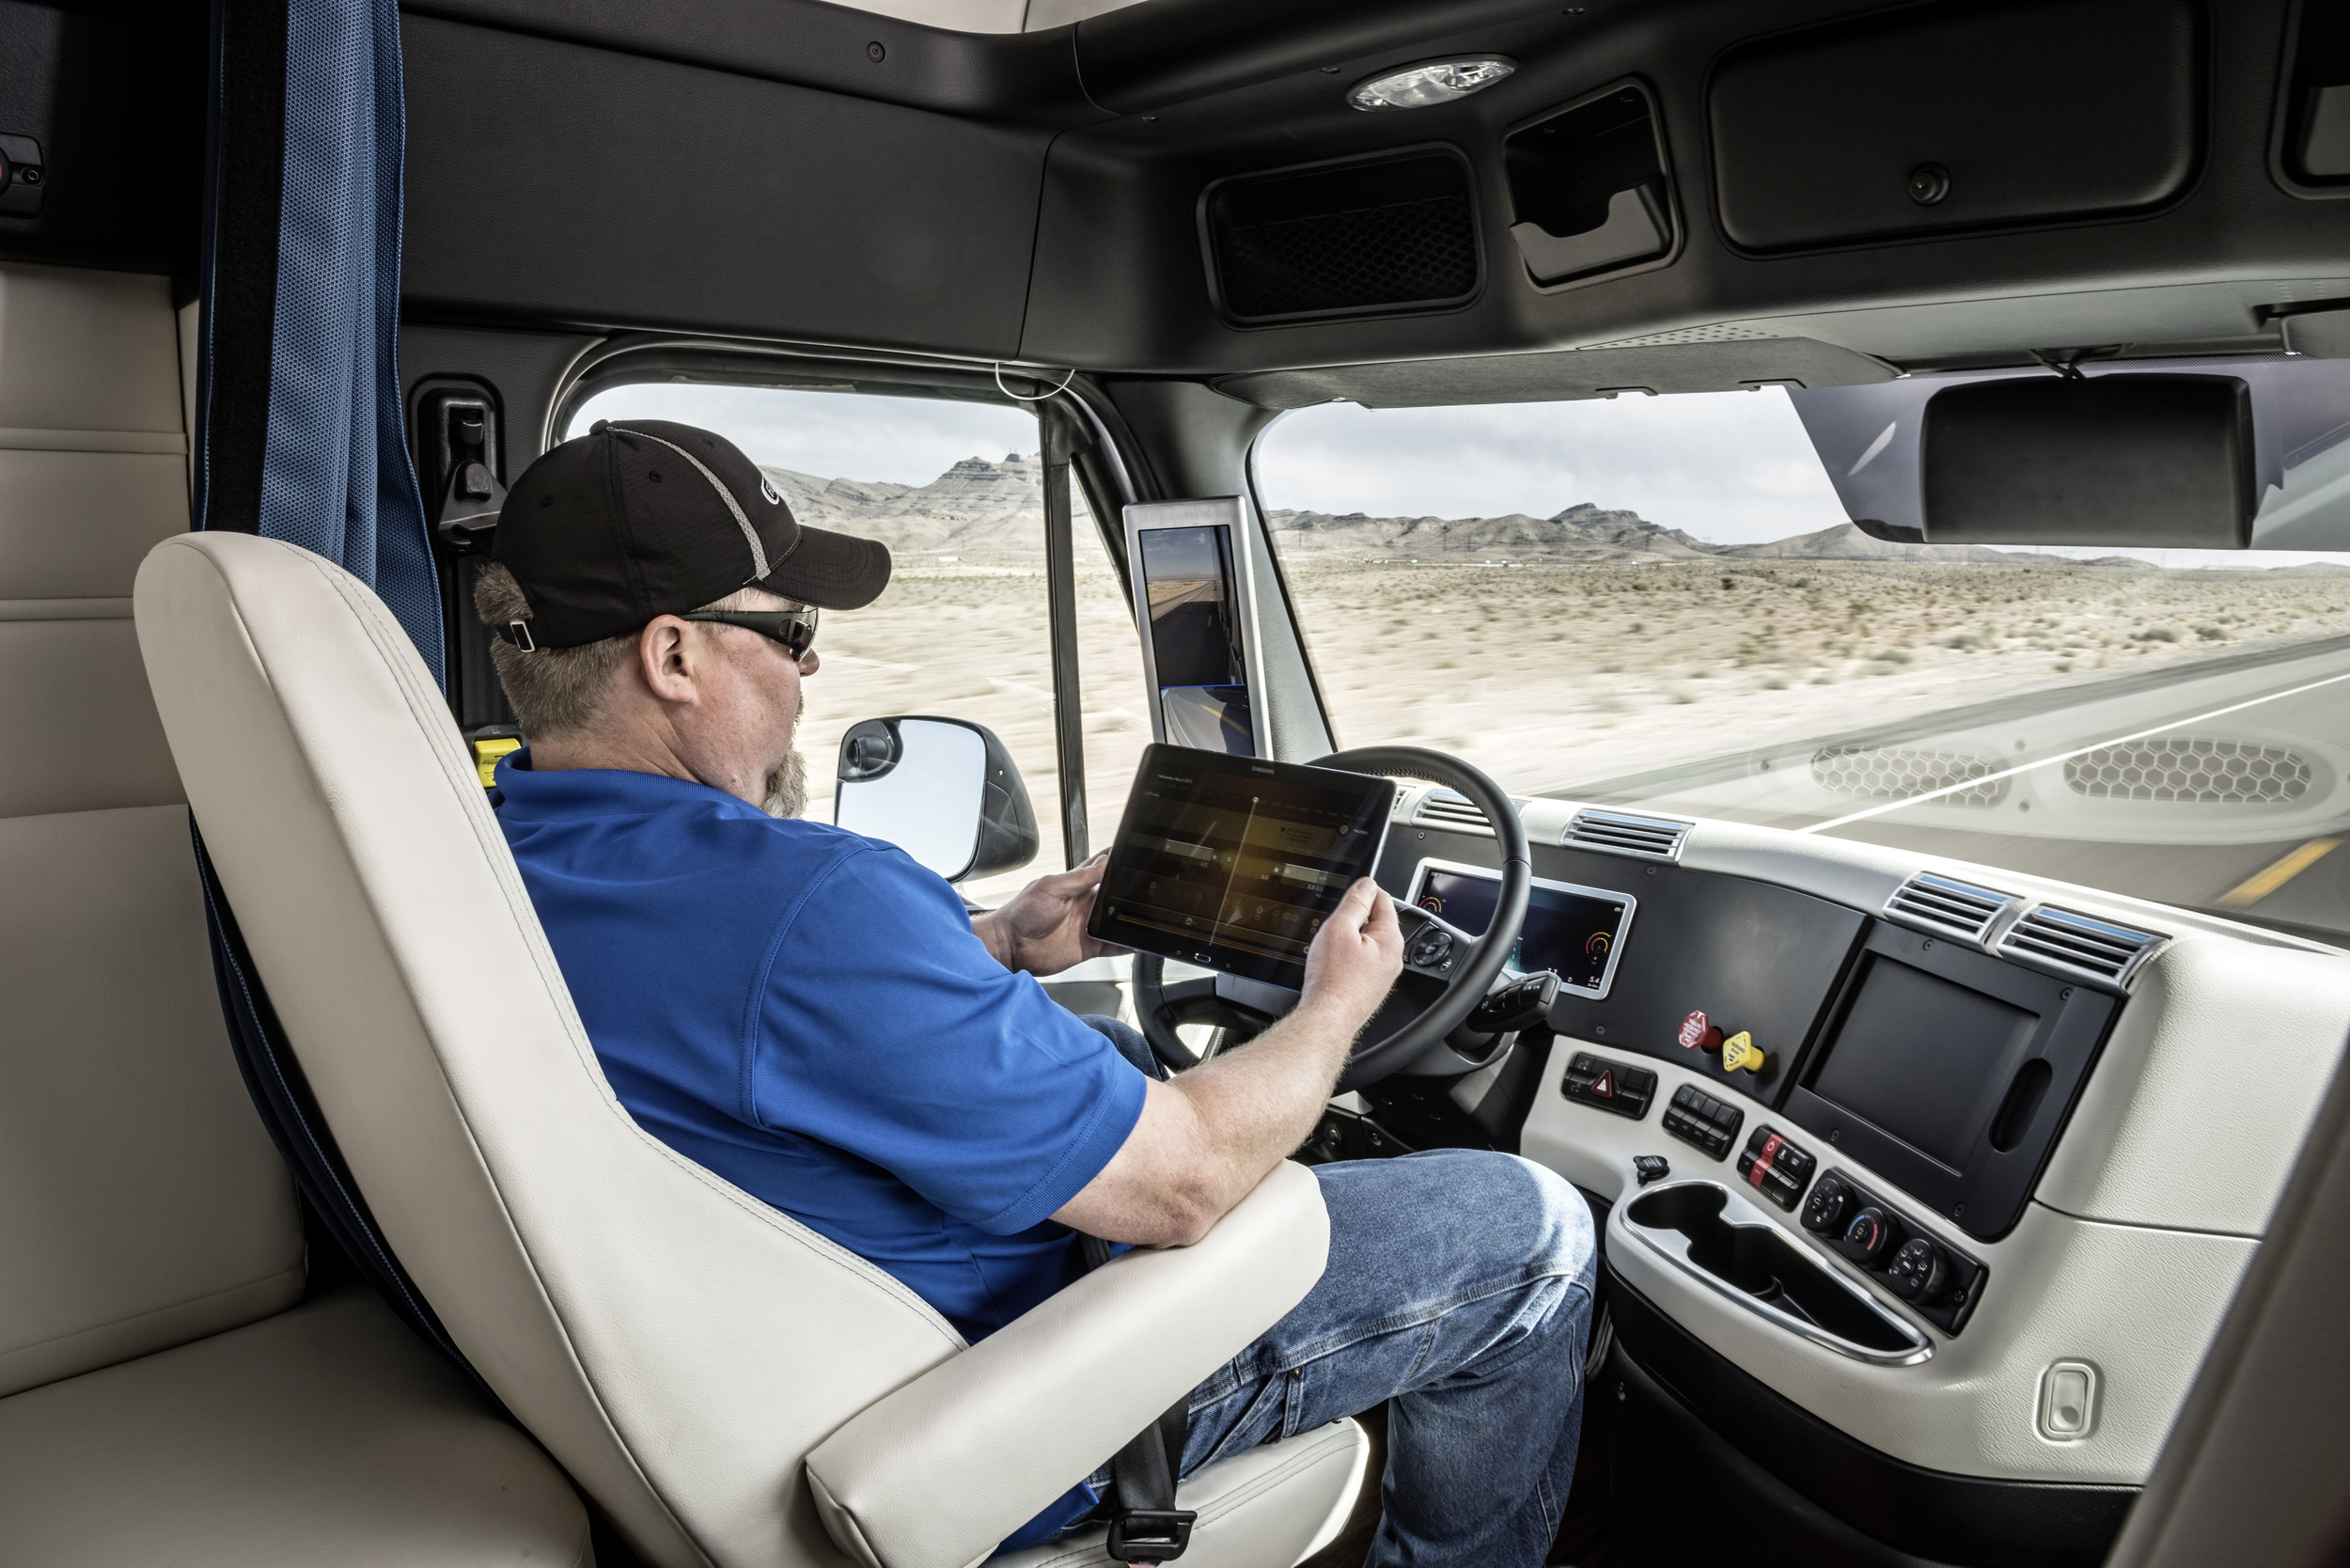 Freightliner_Inspiration_Truck_Driver.jpg